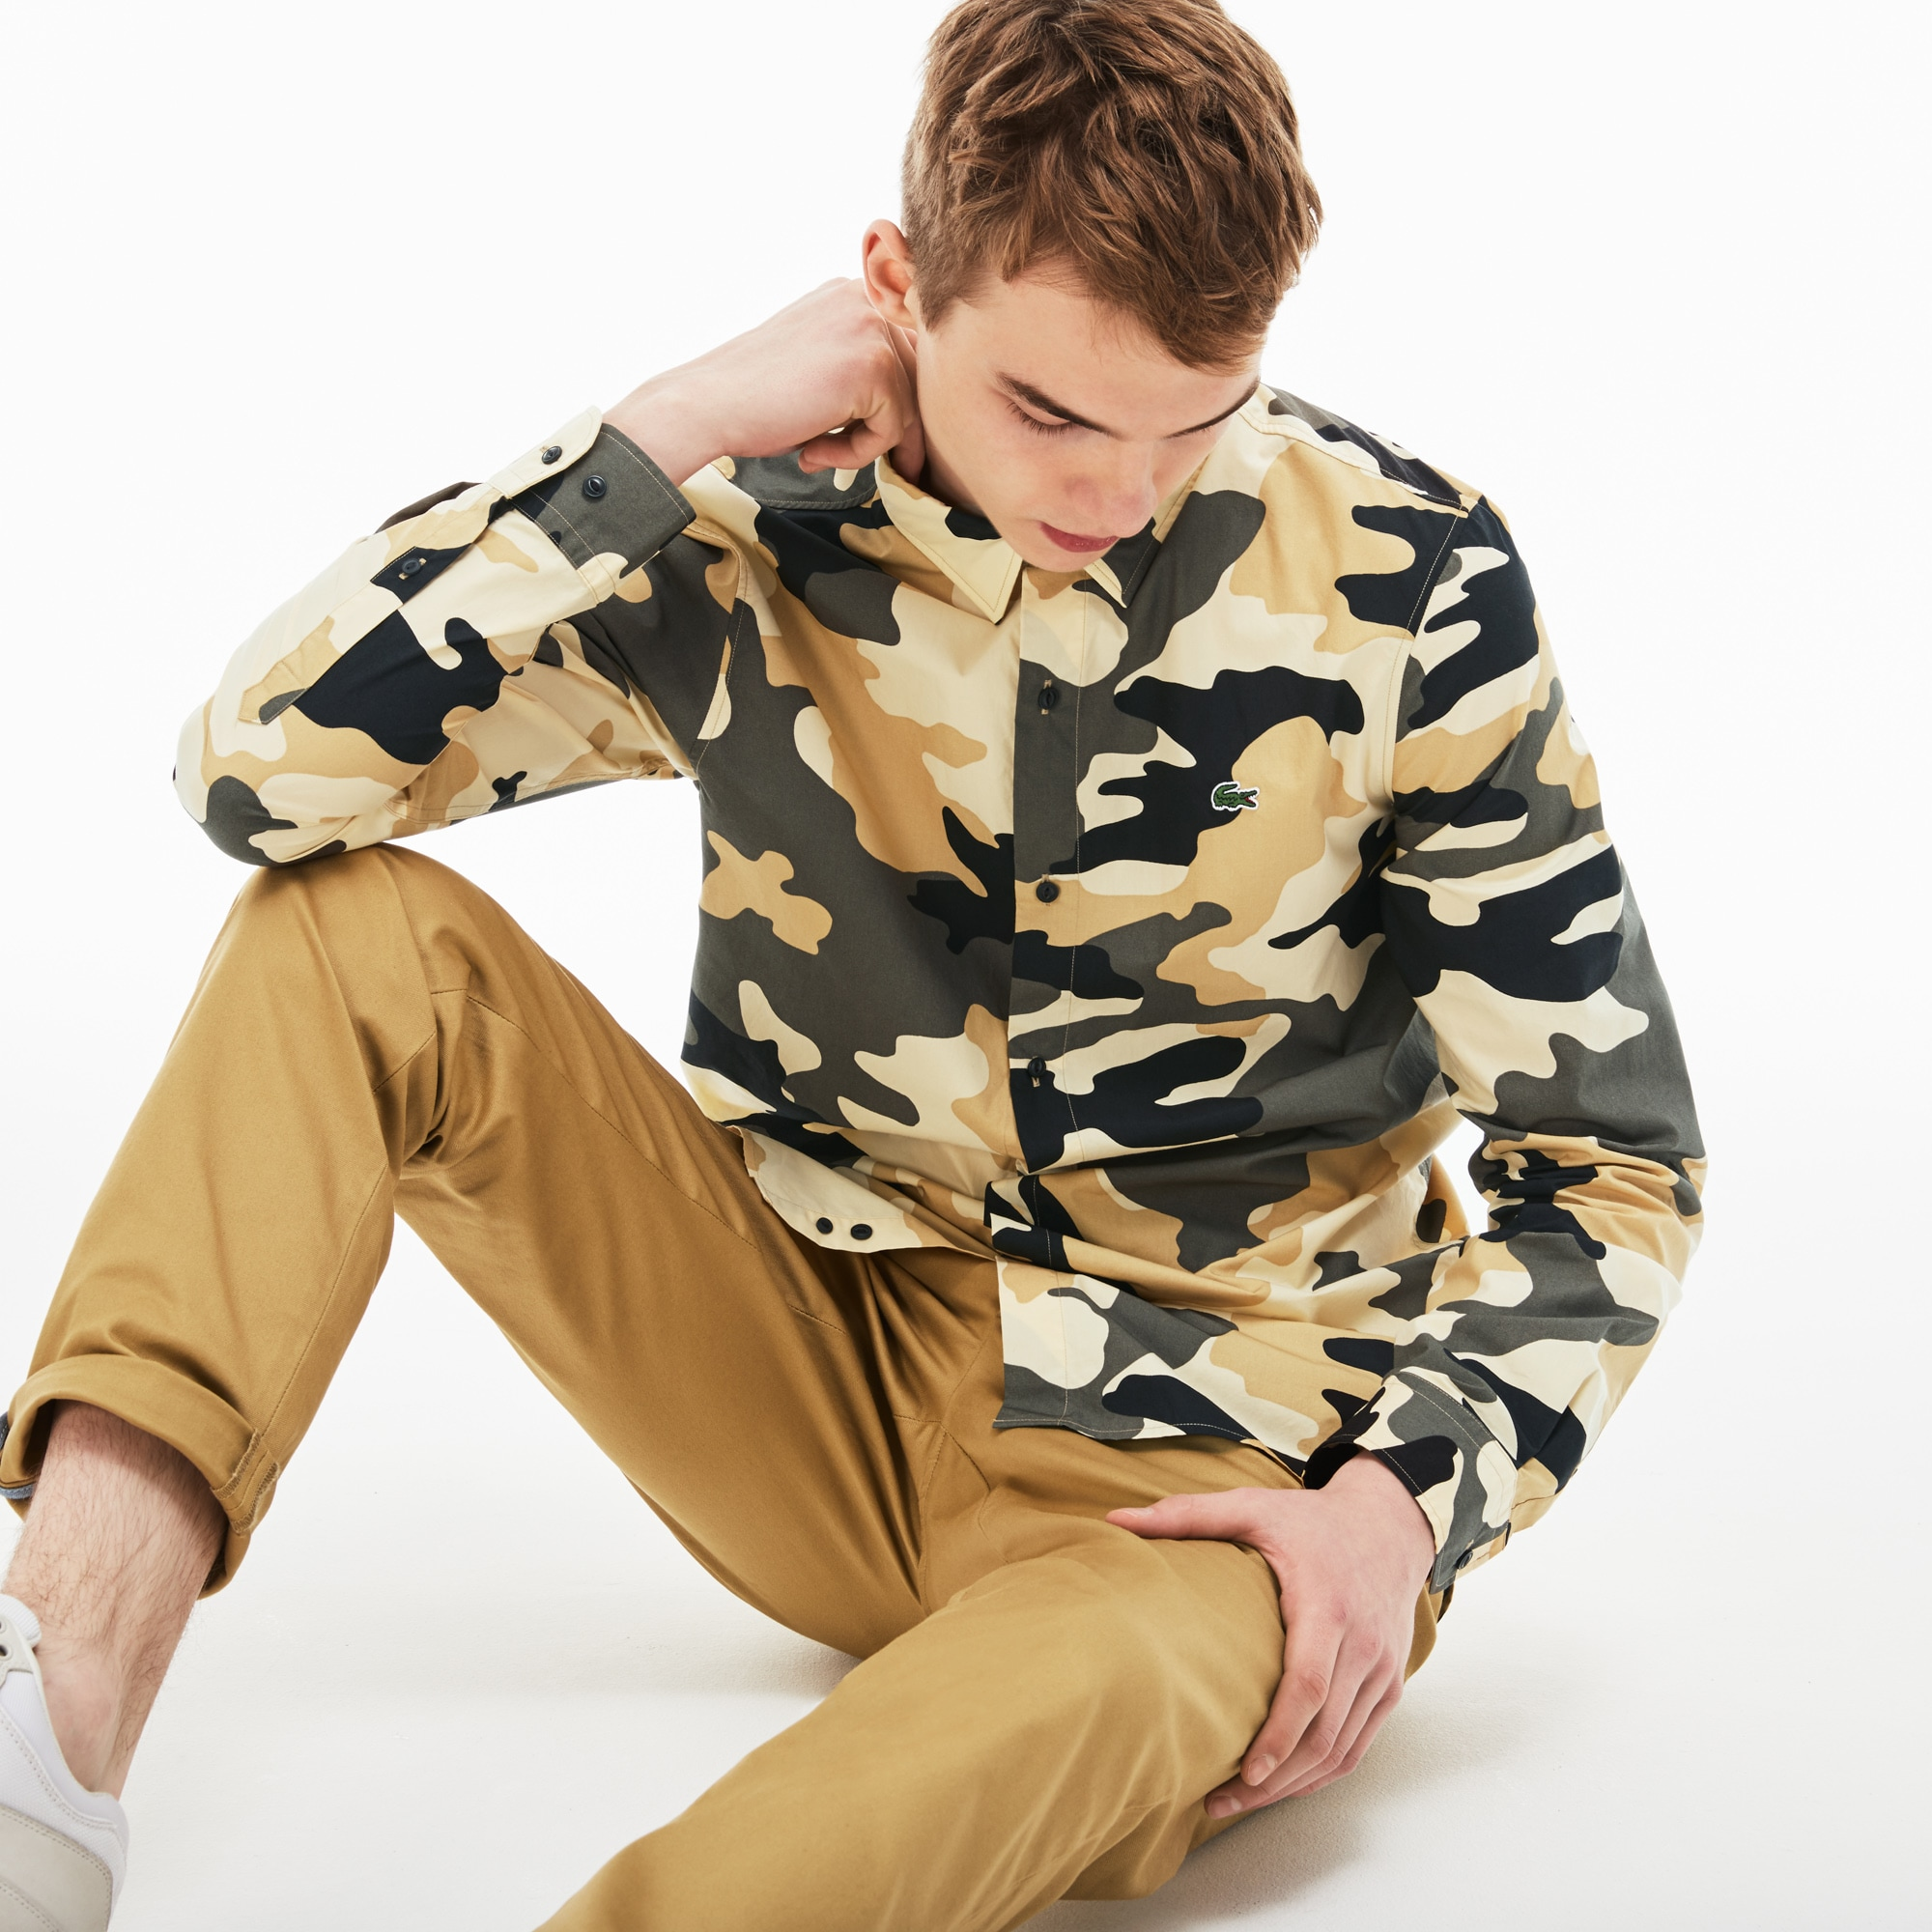 Chemise Skinny fit Lacoste LIVE en popeline imprimé camouflage